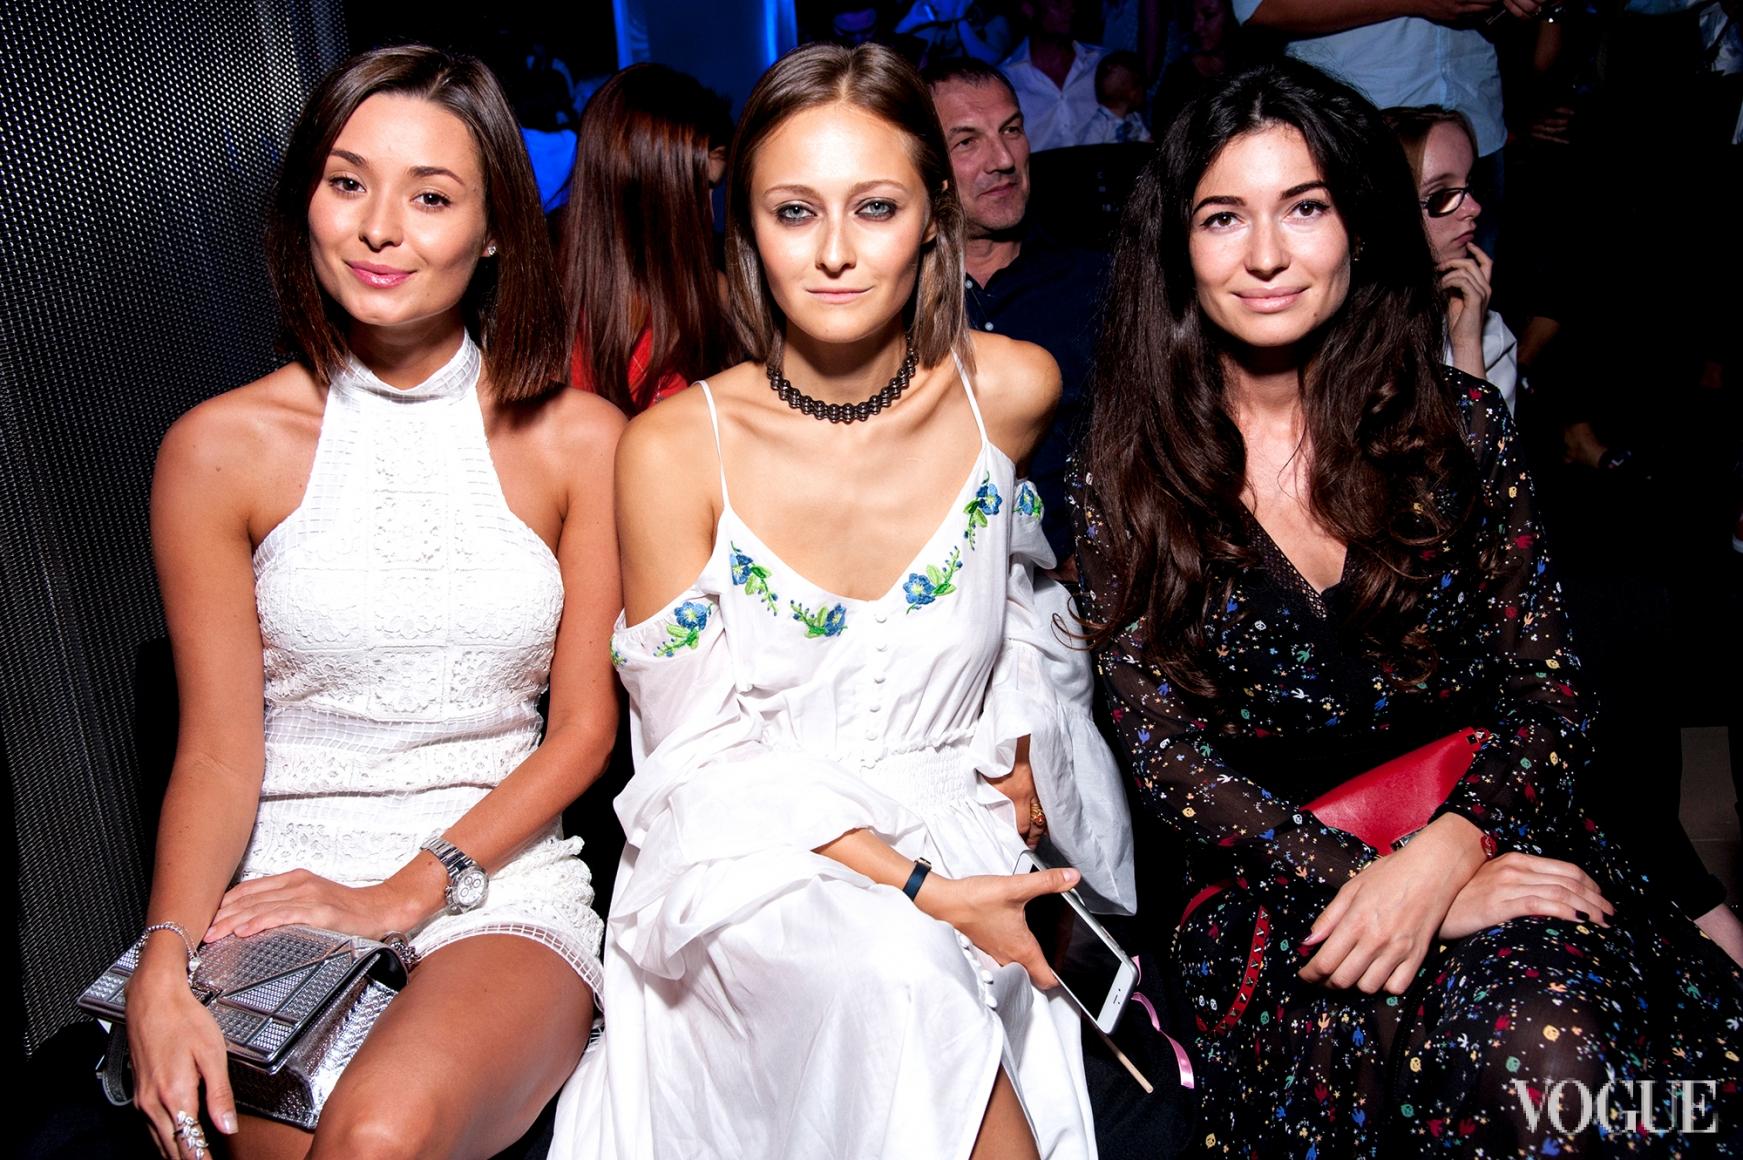 Зоя Литвин, Дарья Шаповалова и Александра Червоненко